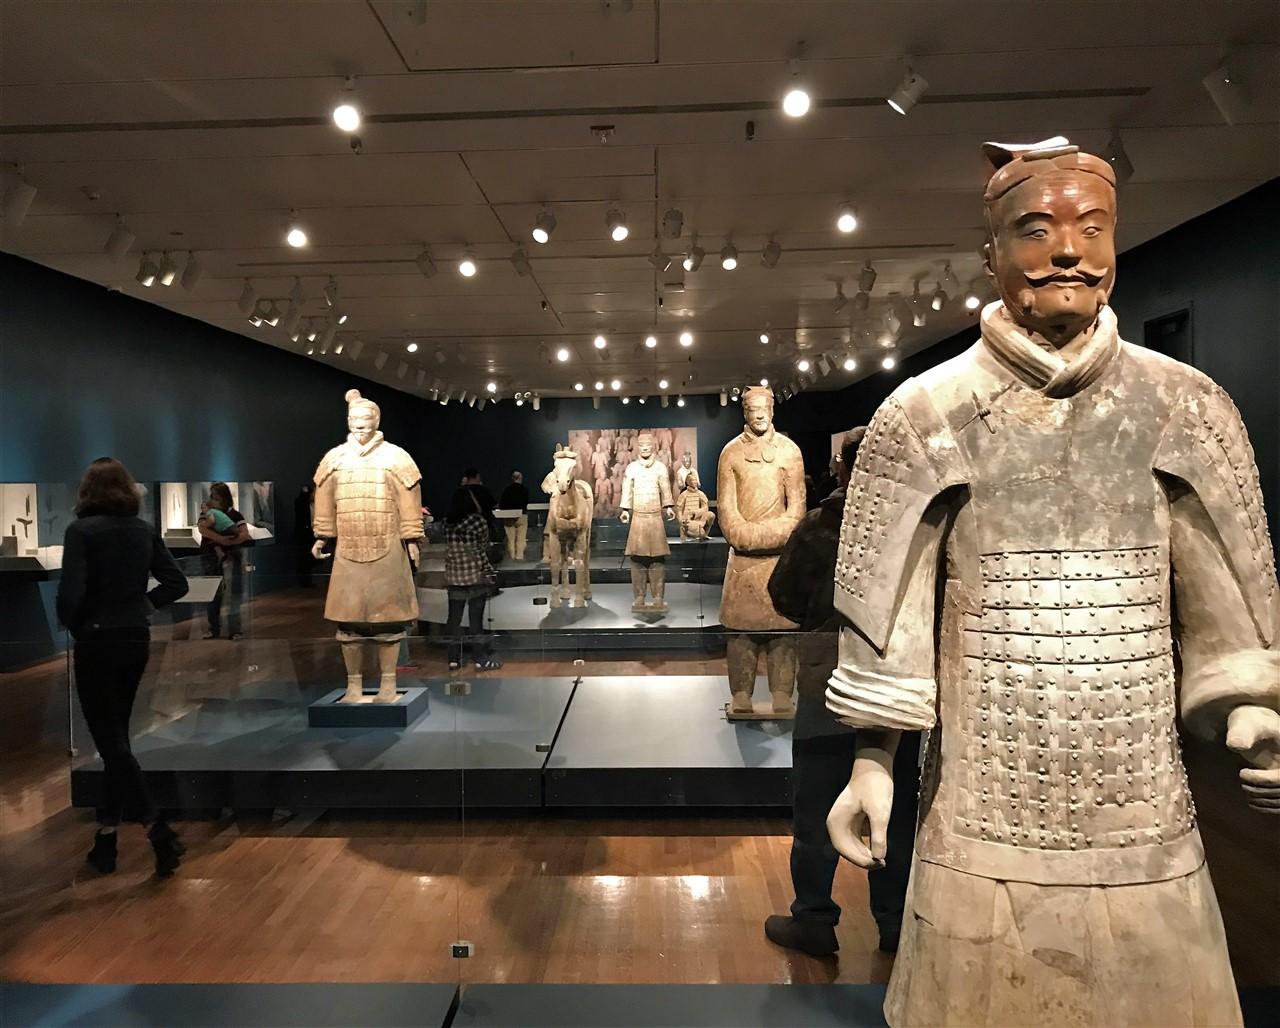 2018 04 21 89 Cincinnati Art Museum.jpg